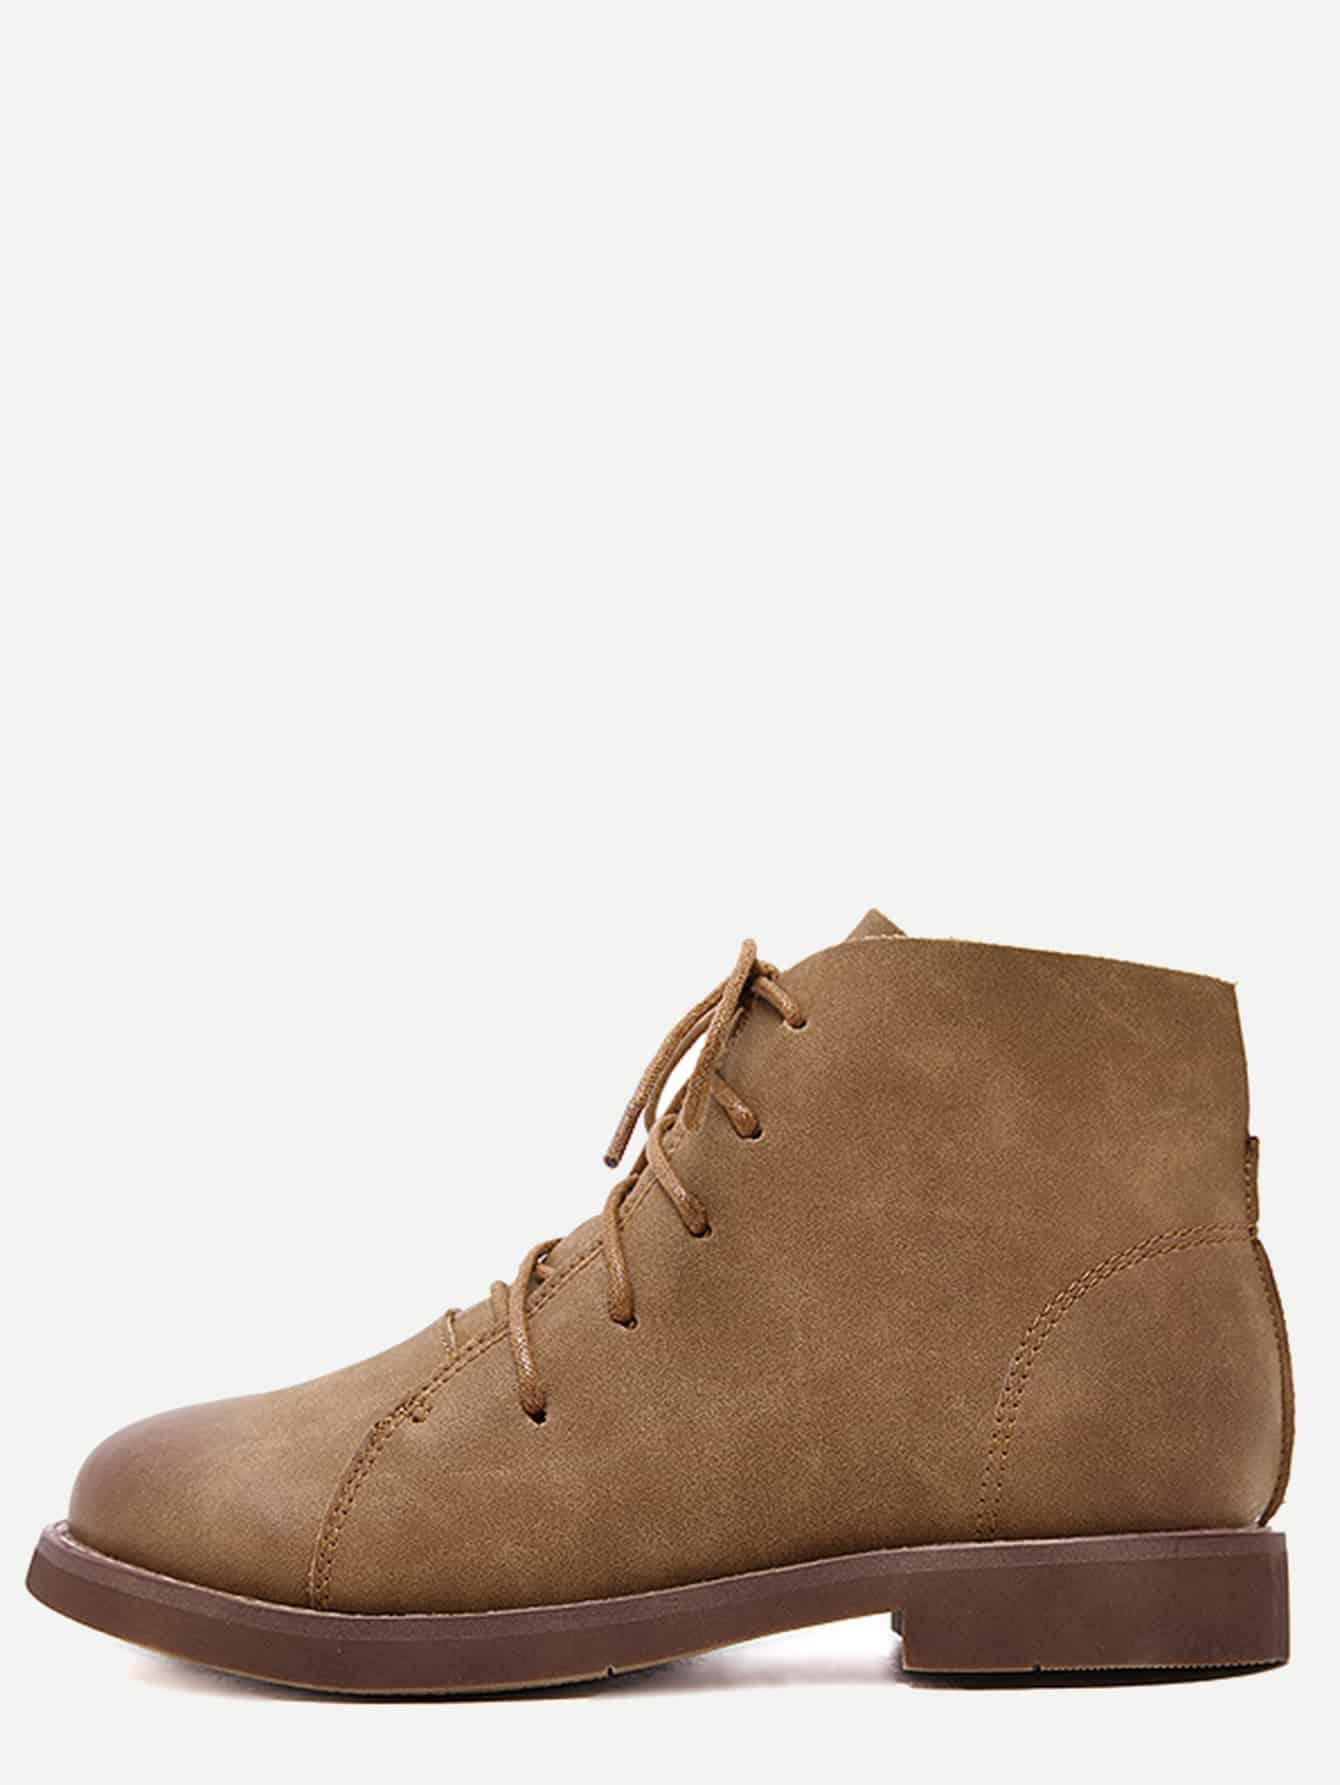 Brown Distressed PU Lace Up Oxford BootsBrown Distressed PU Lace Up Oxford Boots<br><br>color: Brown<br>size: EUR35,EUR36,EUR37,EUR40